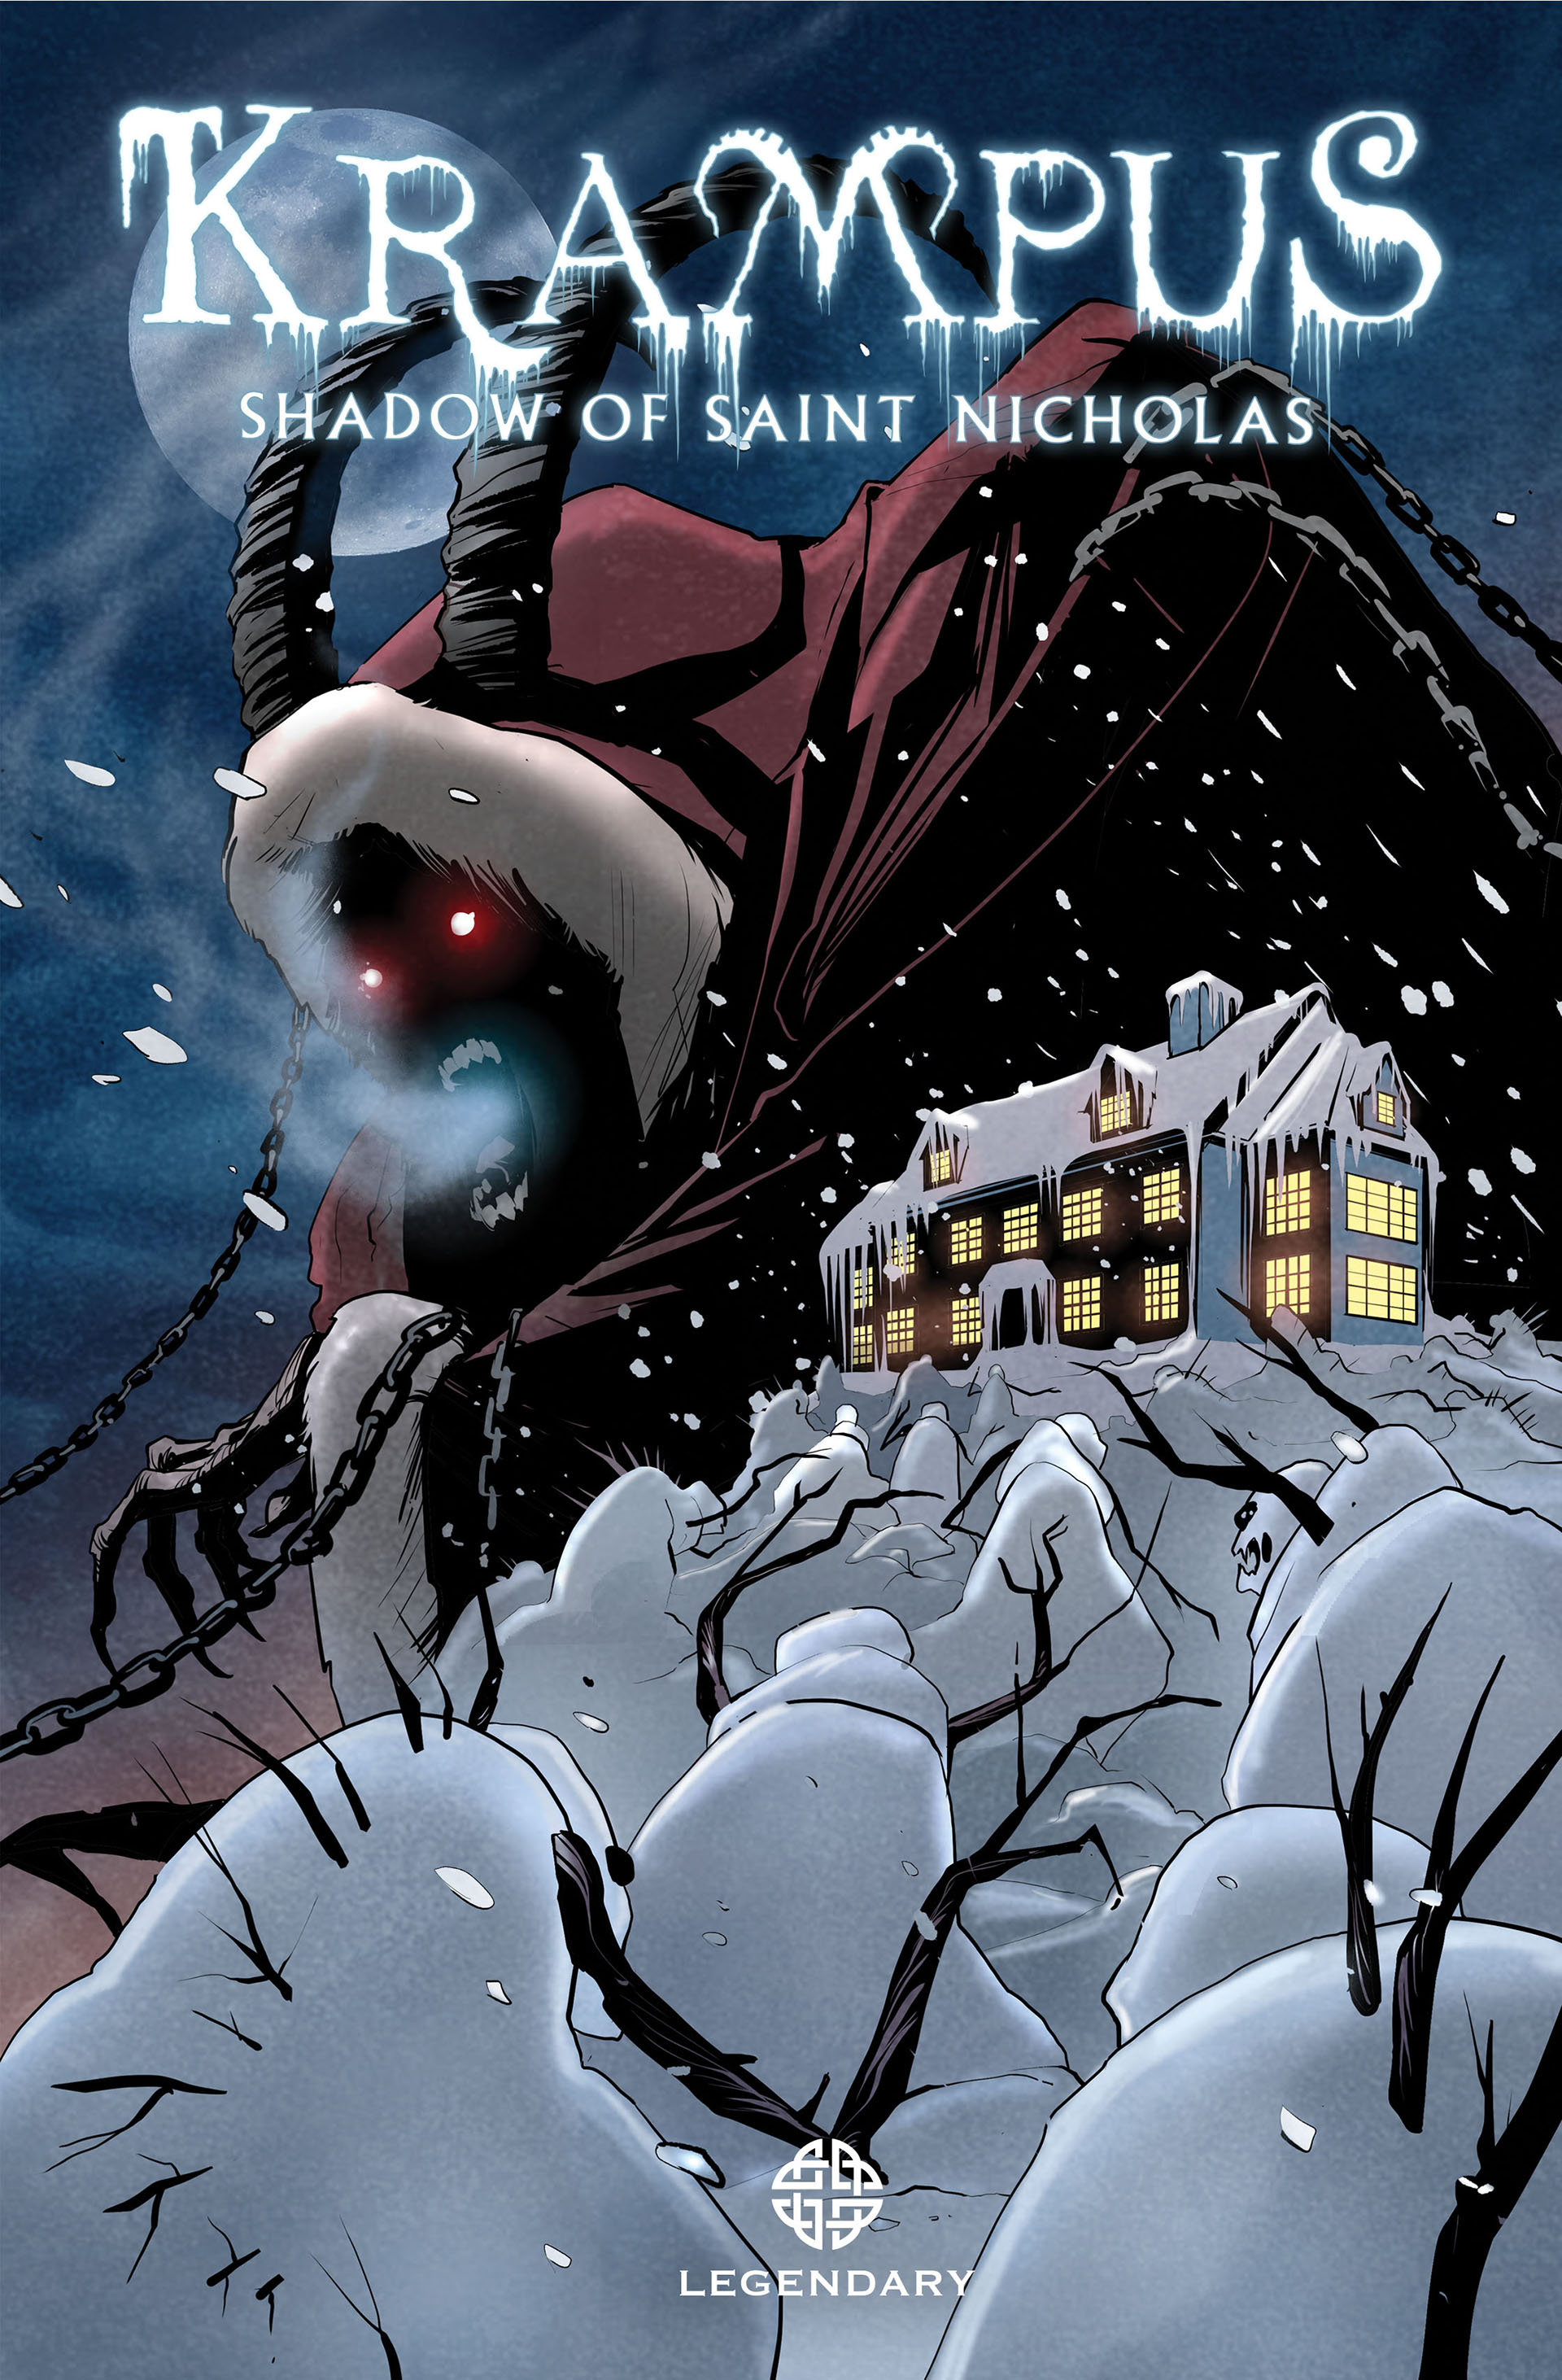 Krampus Shadow of Saint Nicholas